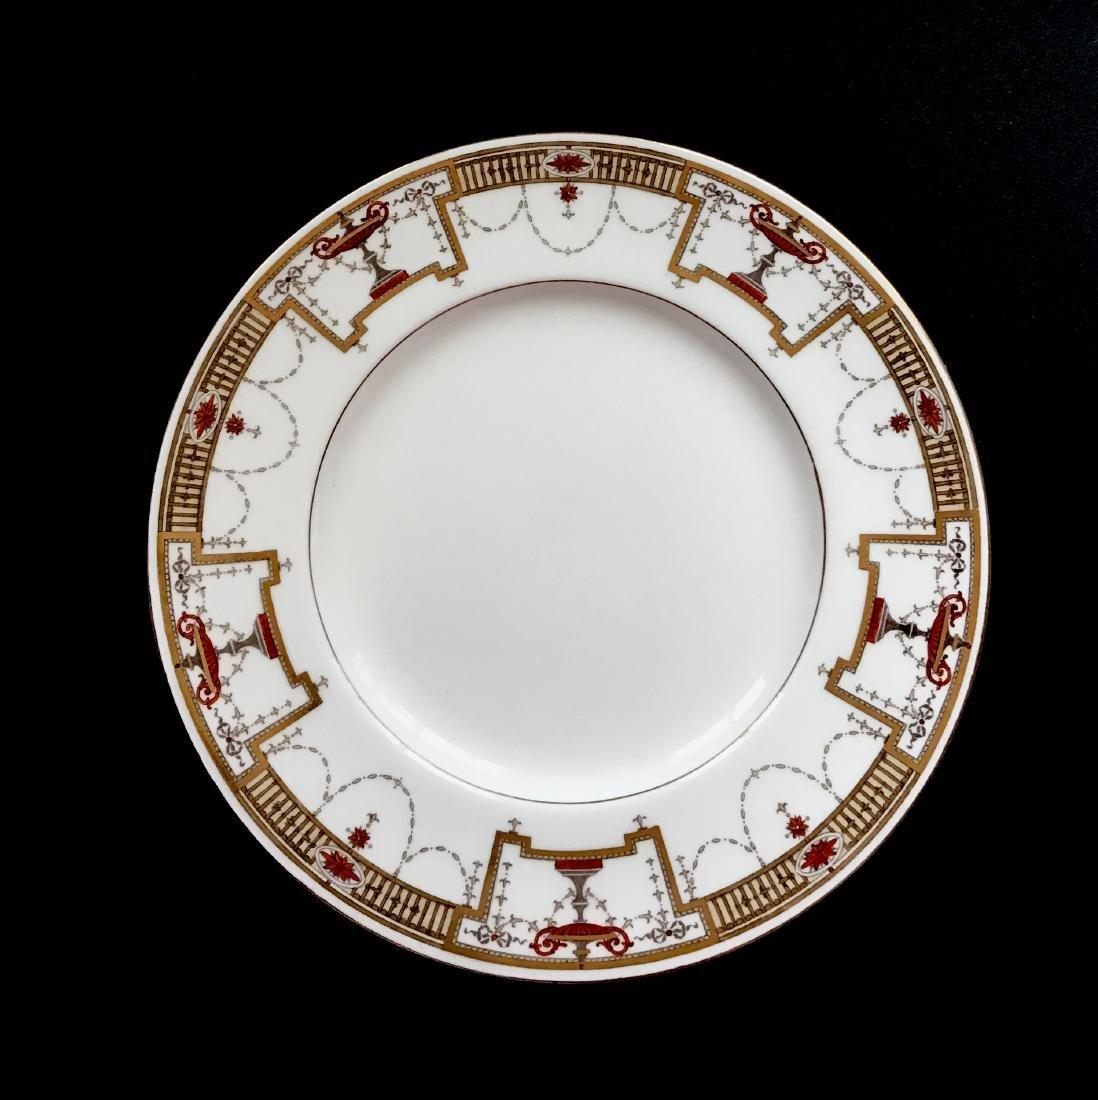 12 Tiffany & Co Minton Porcelain Luncheon Plates - 3